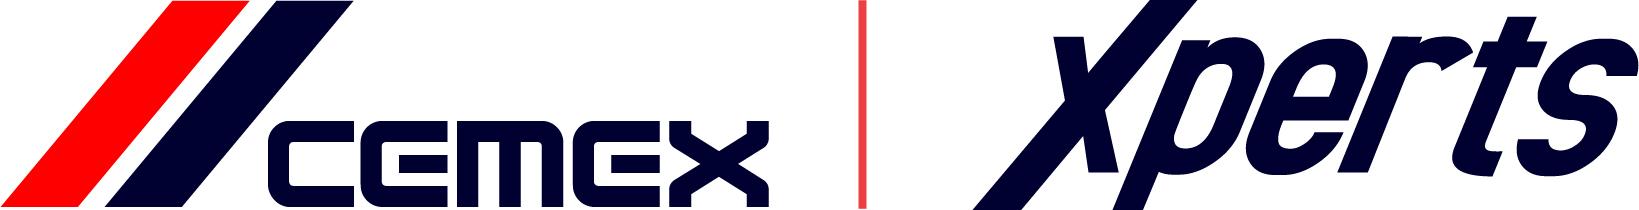 Cemex Xperts partner